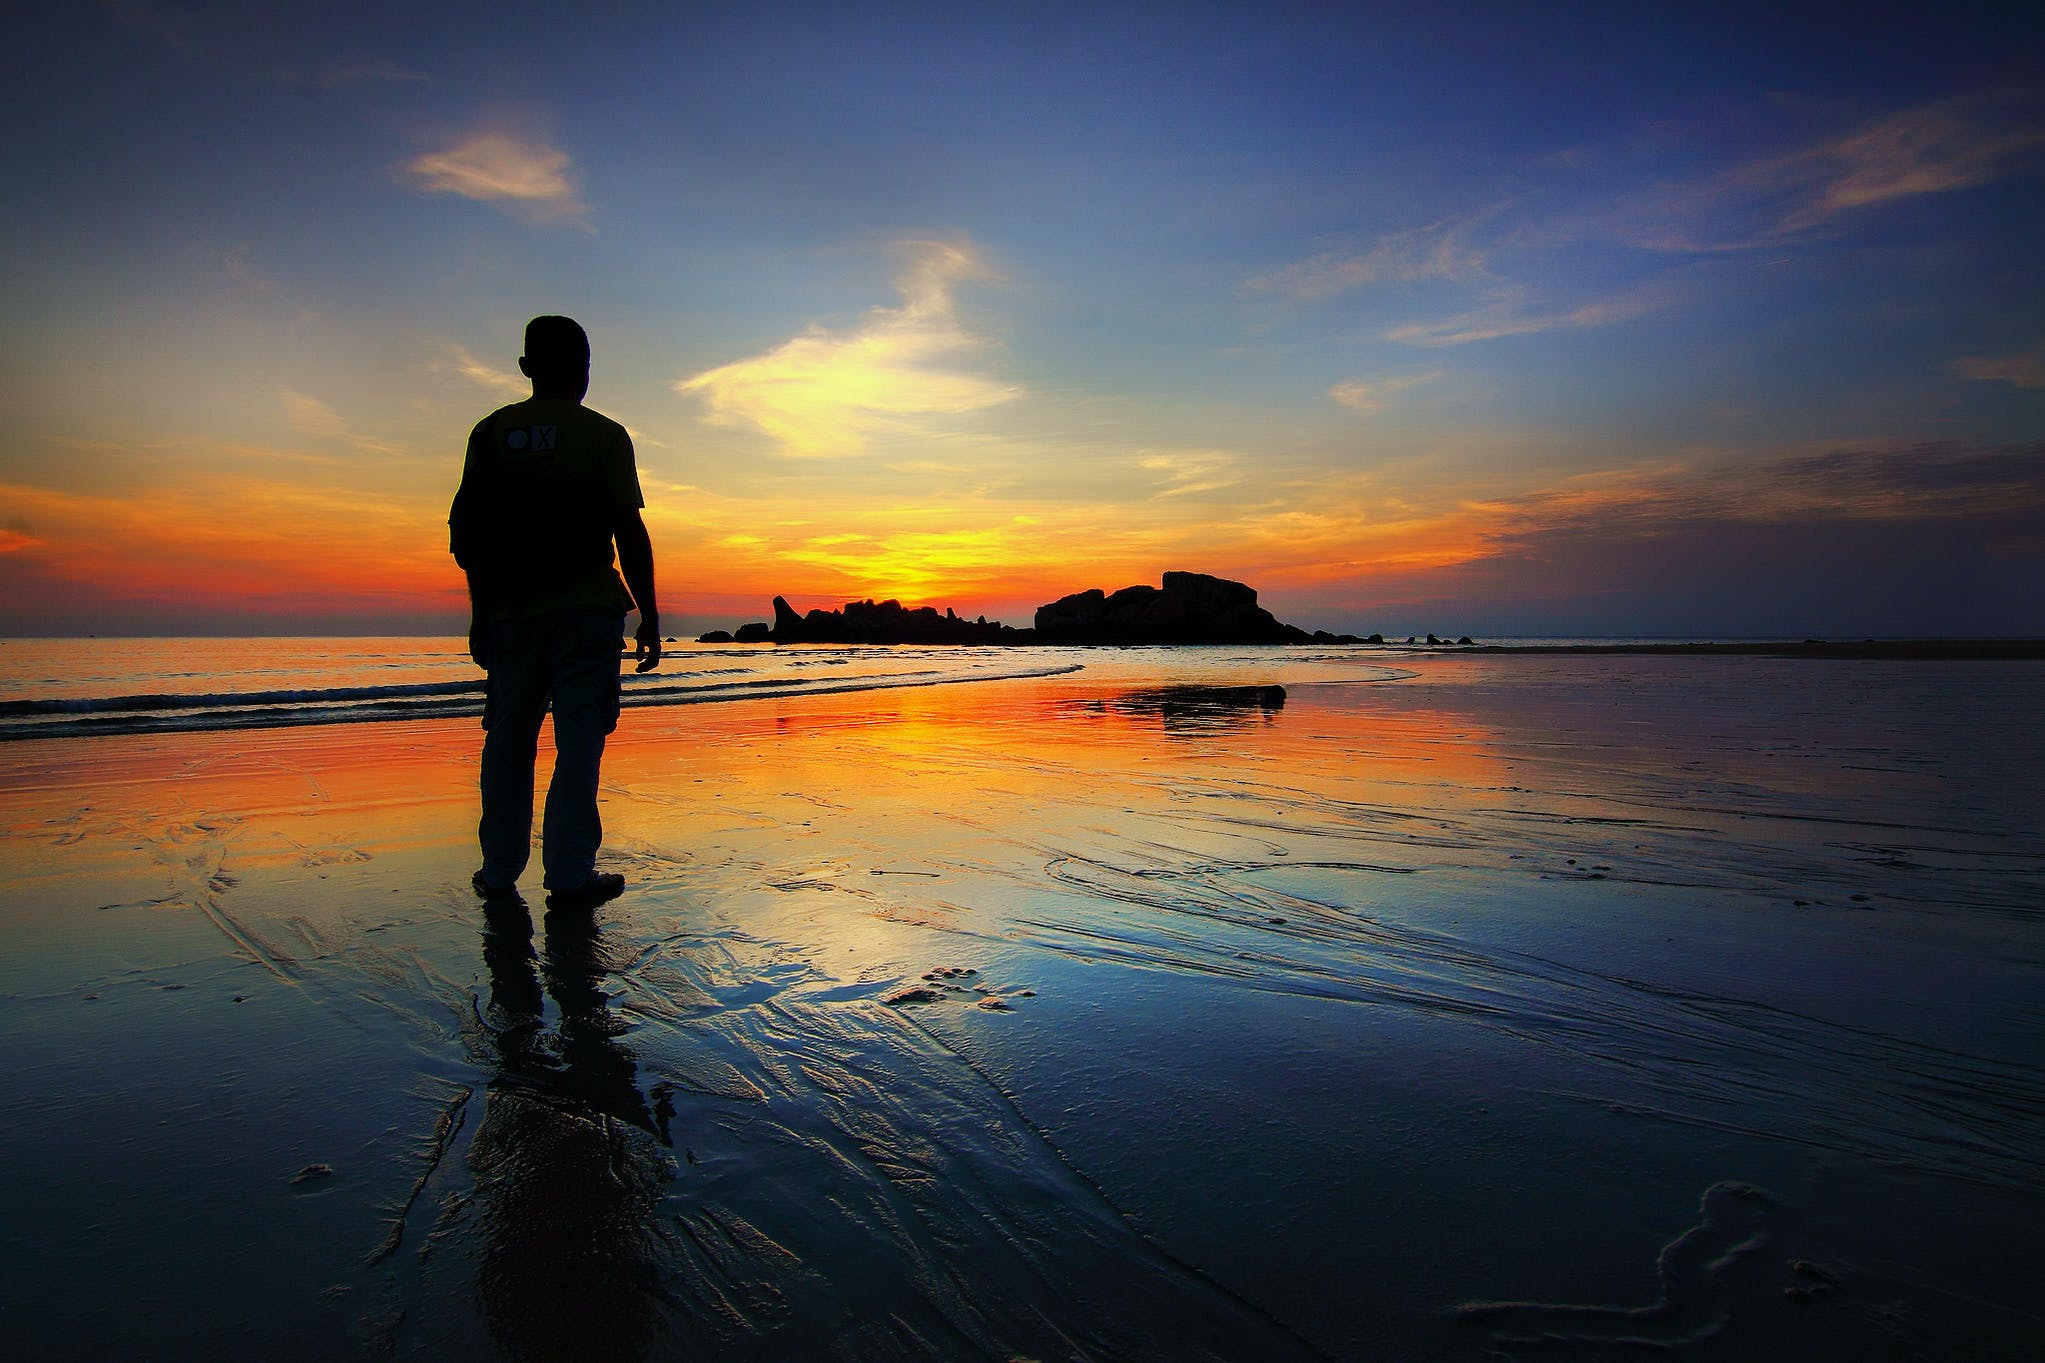 backlit, beach, calm